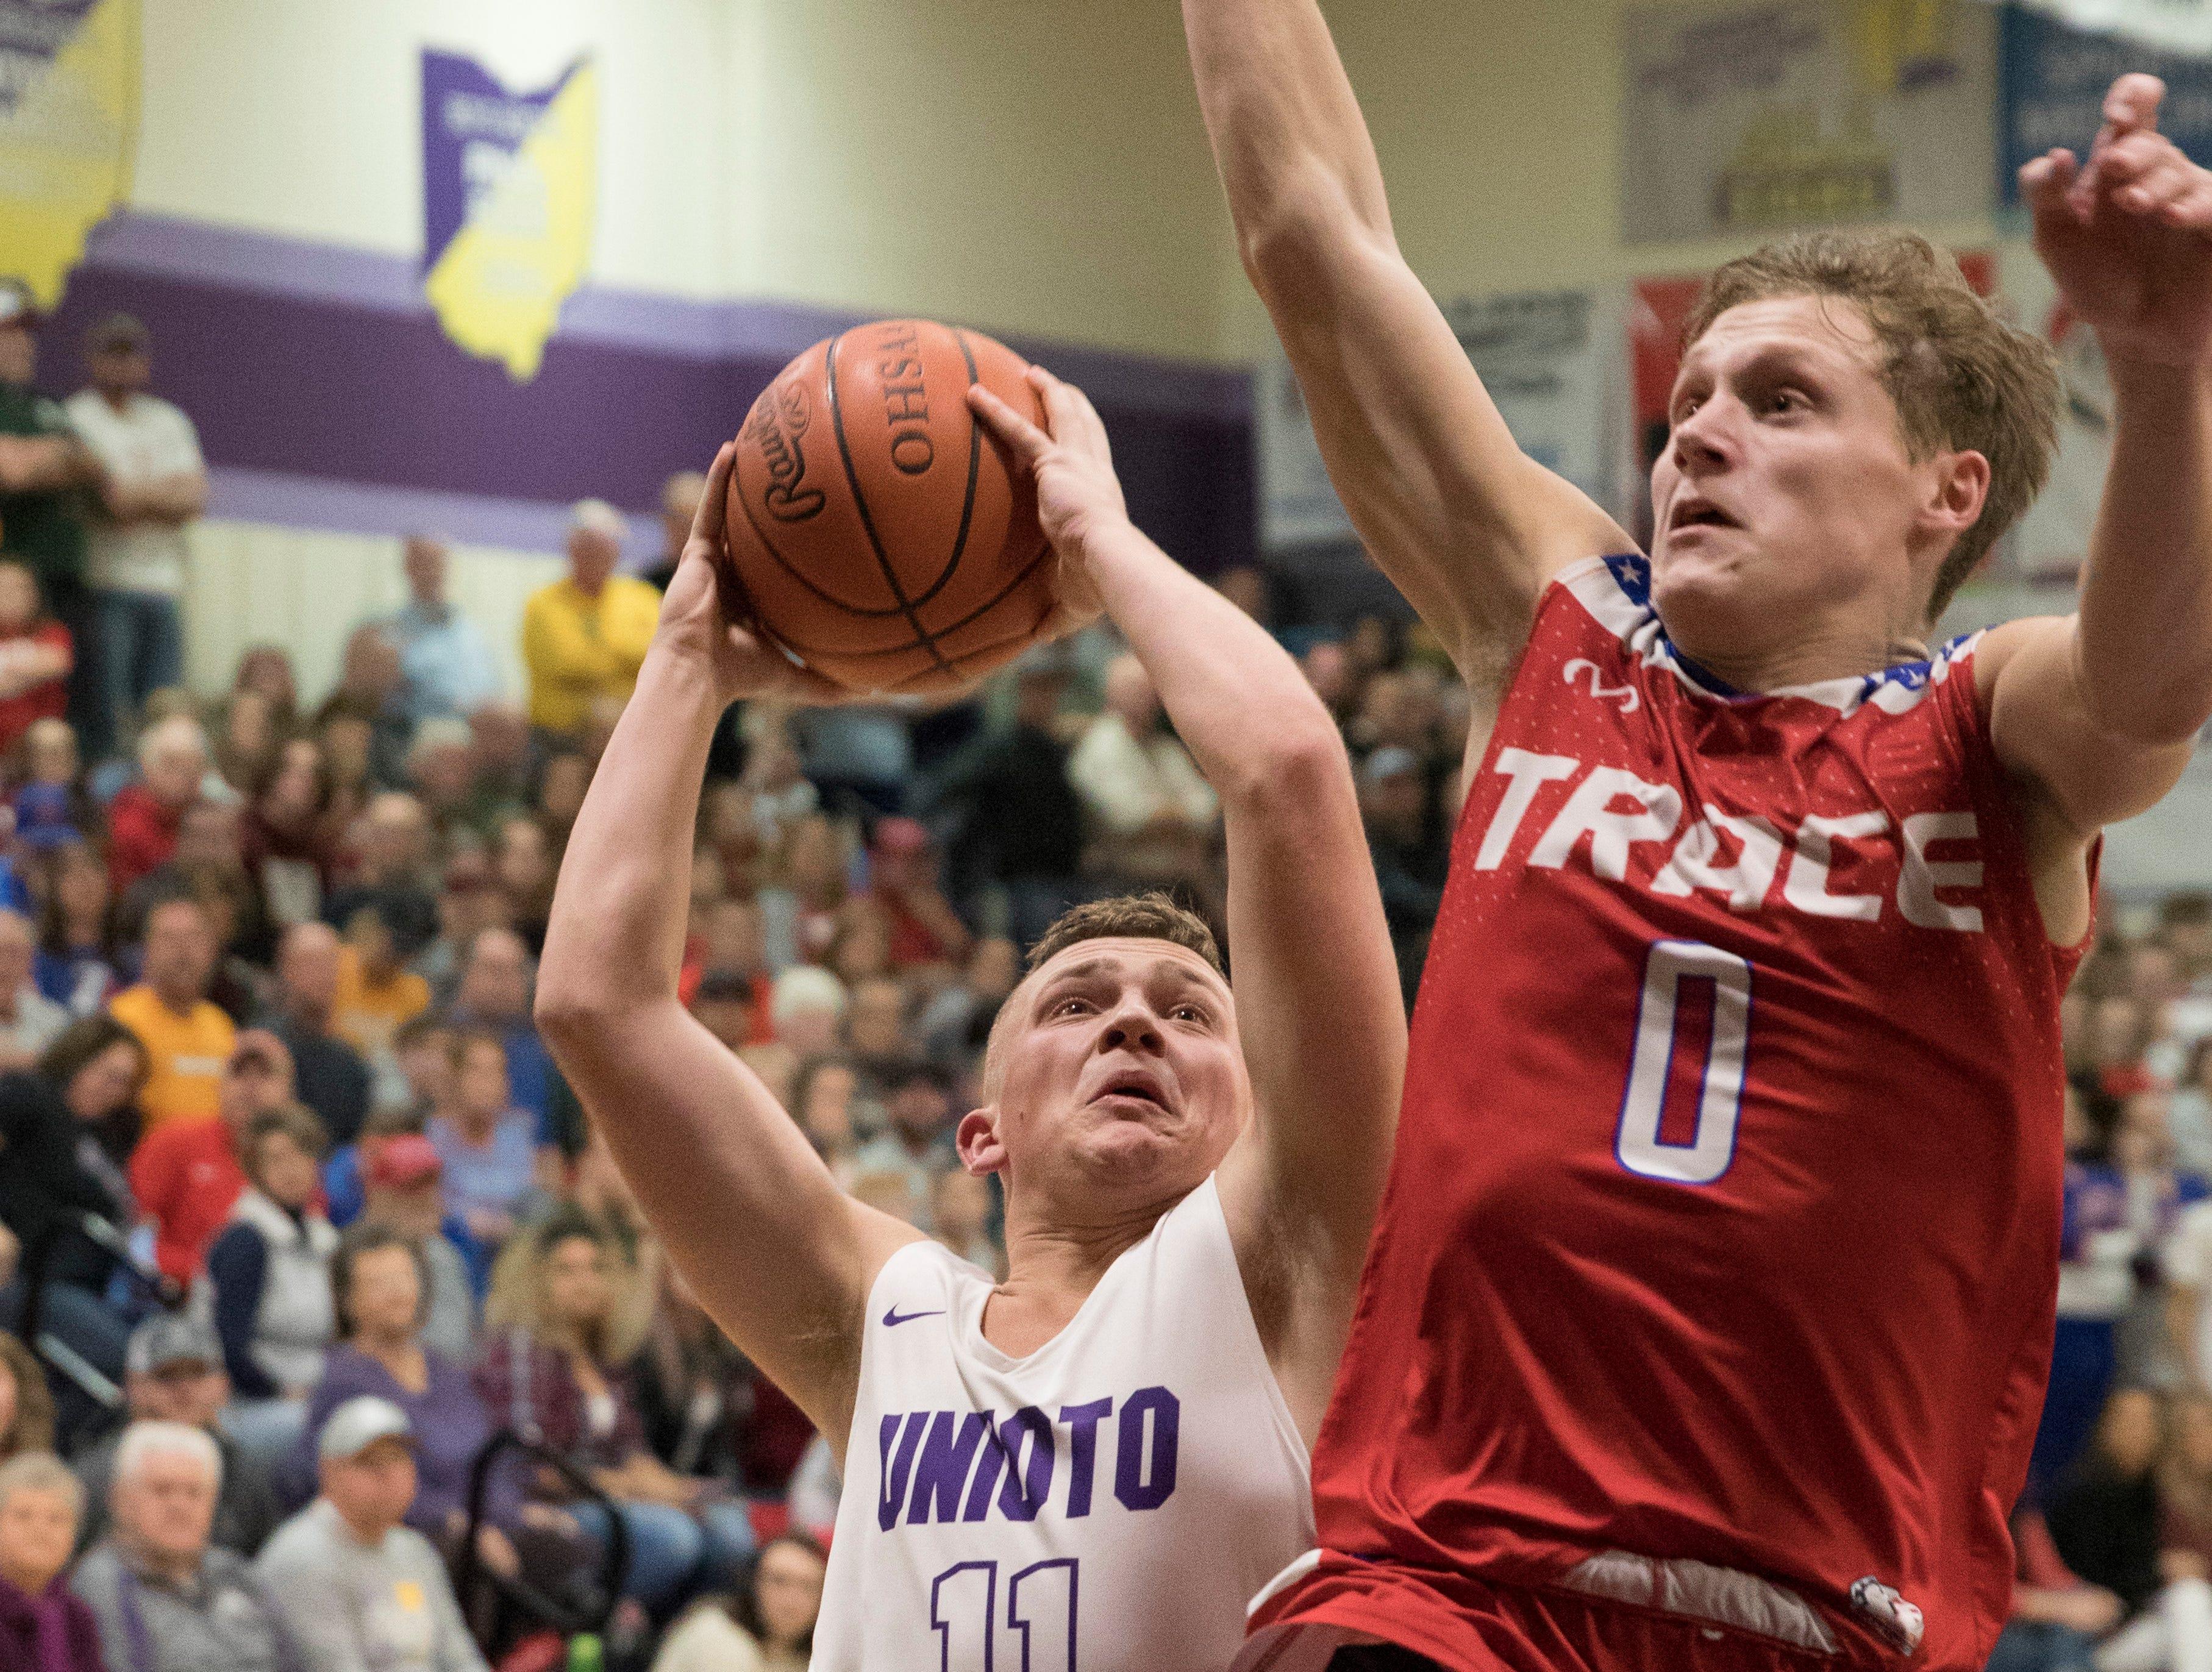 Zane Trace defeated Unioto 69-50 Friday night at Unioto High School, breaking Unioto's historic 69 game SVC winning streak.